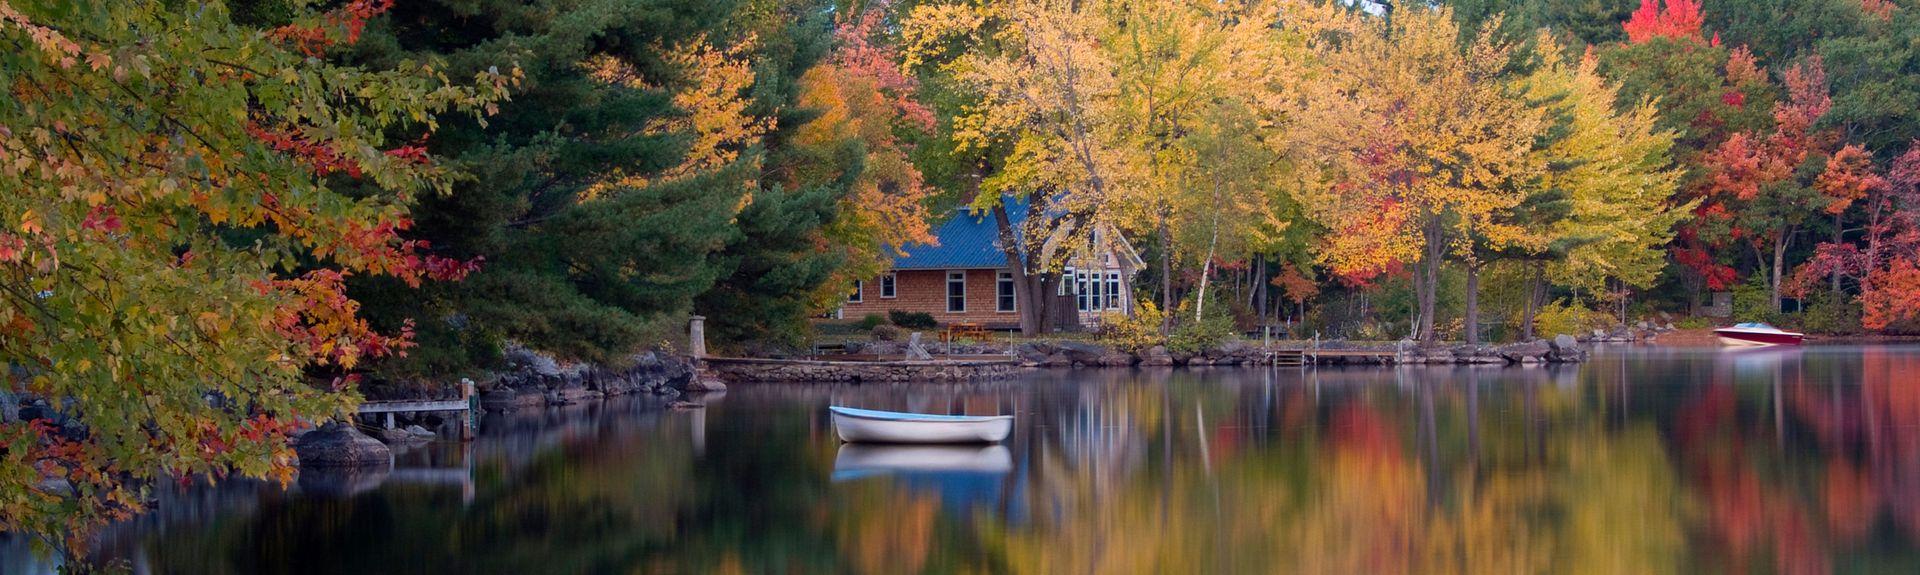 Long Lake, Maine, United States of America